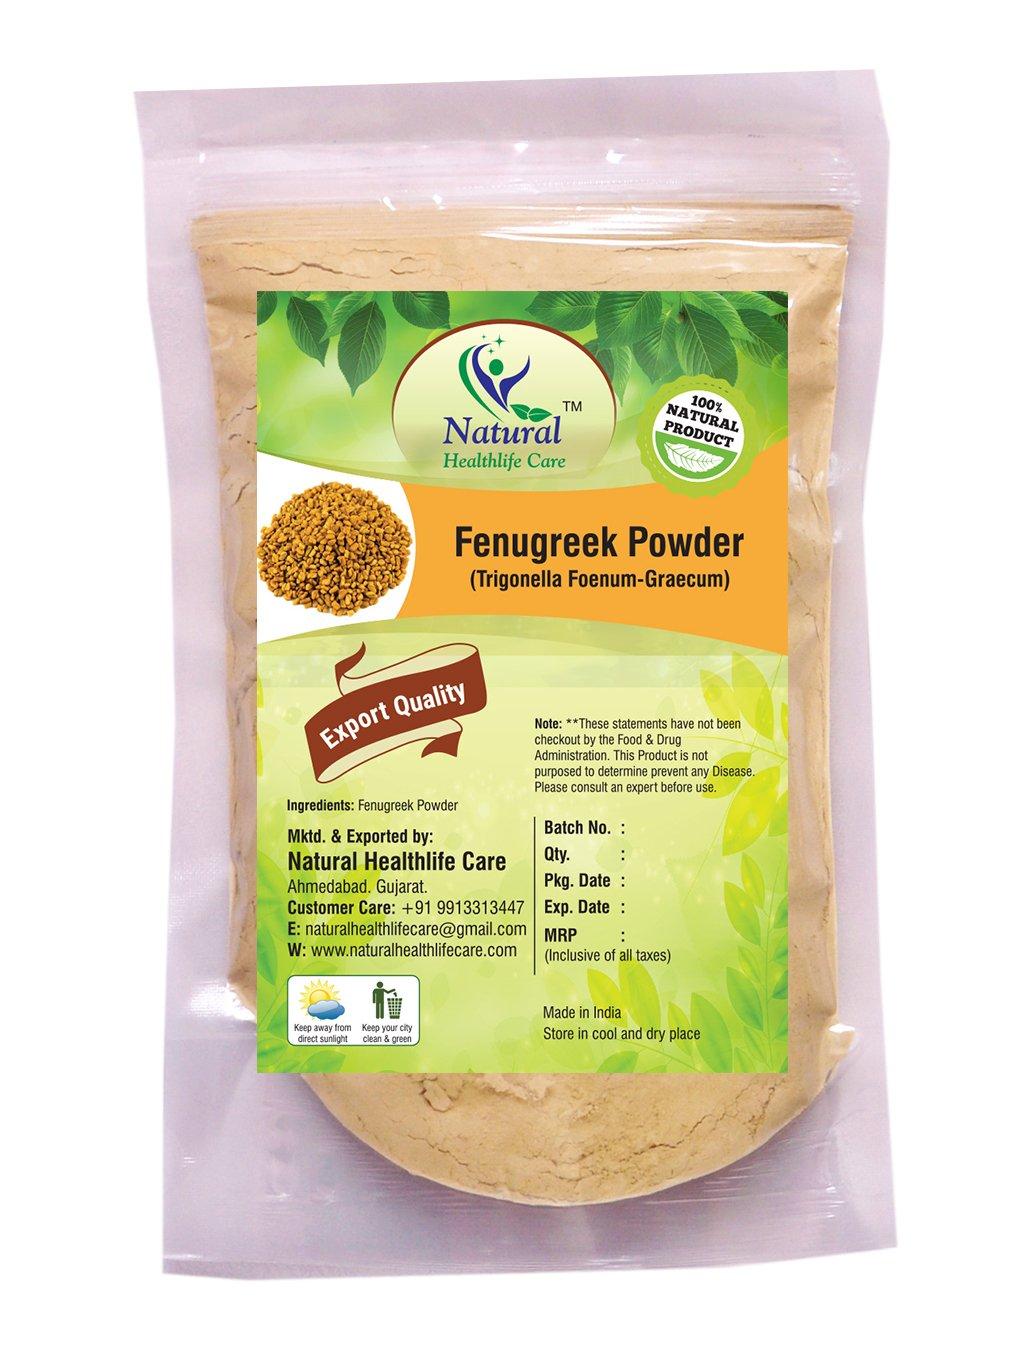 Natural Healthlife Care 100% Pure Natural Fenugreek Seeds (Trigonella Foenum Powder- Methi) Powder for LONG HAIRS NATURALLY(1/2 lb/8 ounces/227 g)